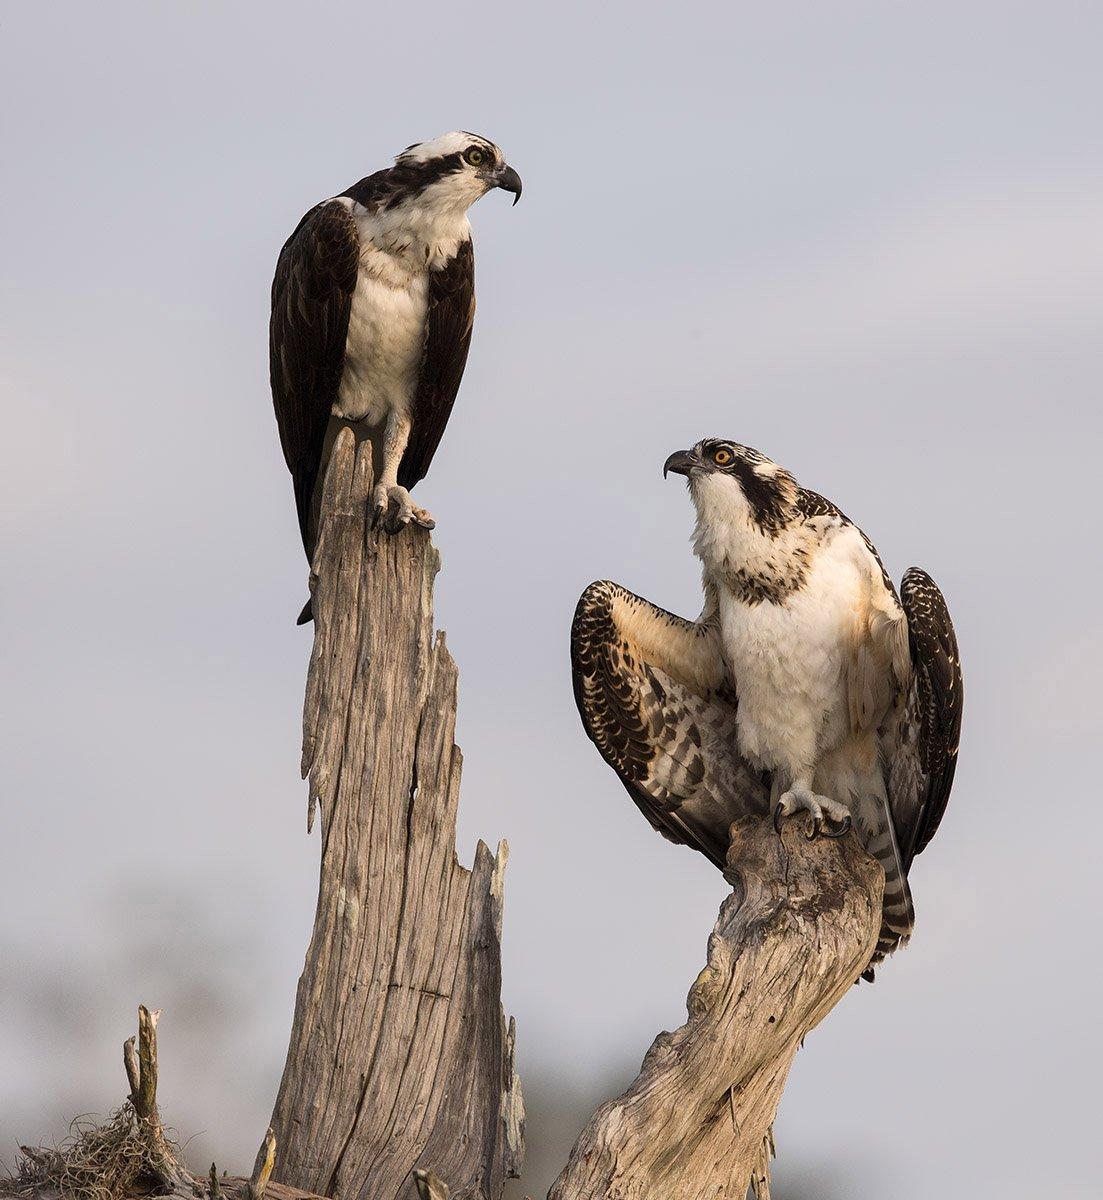 скопа, osprey, florida, флорида, blue cypress lake, Elizabeth E